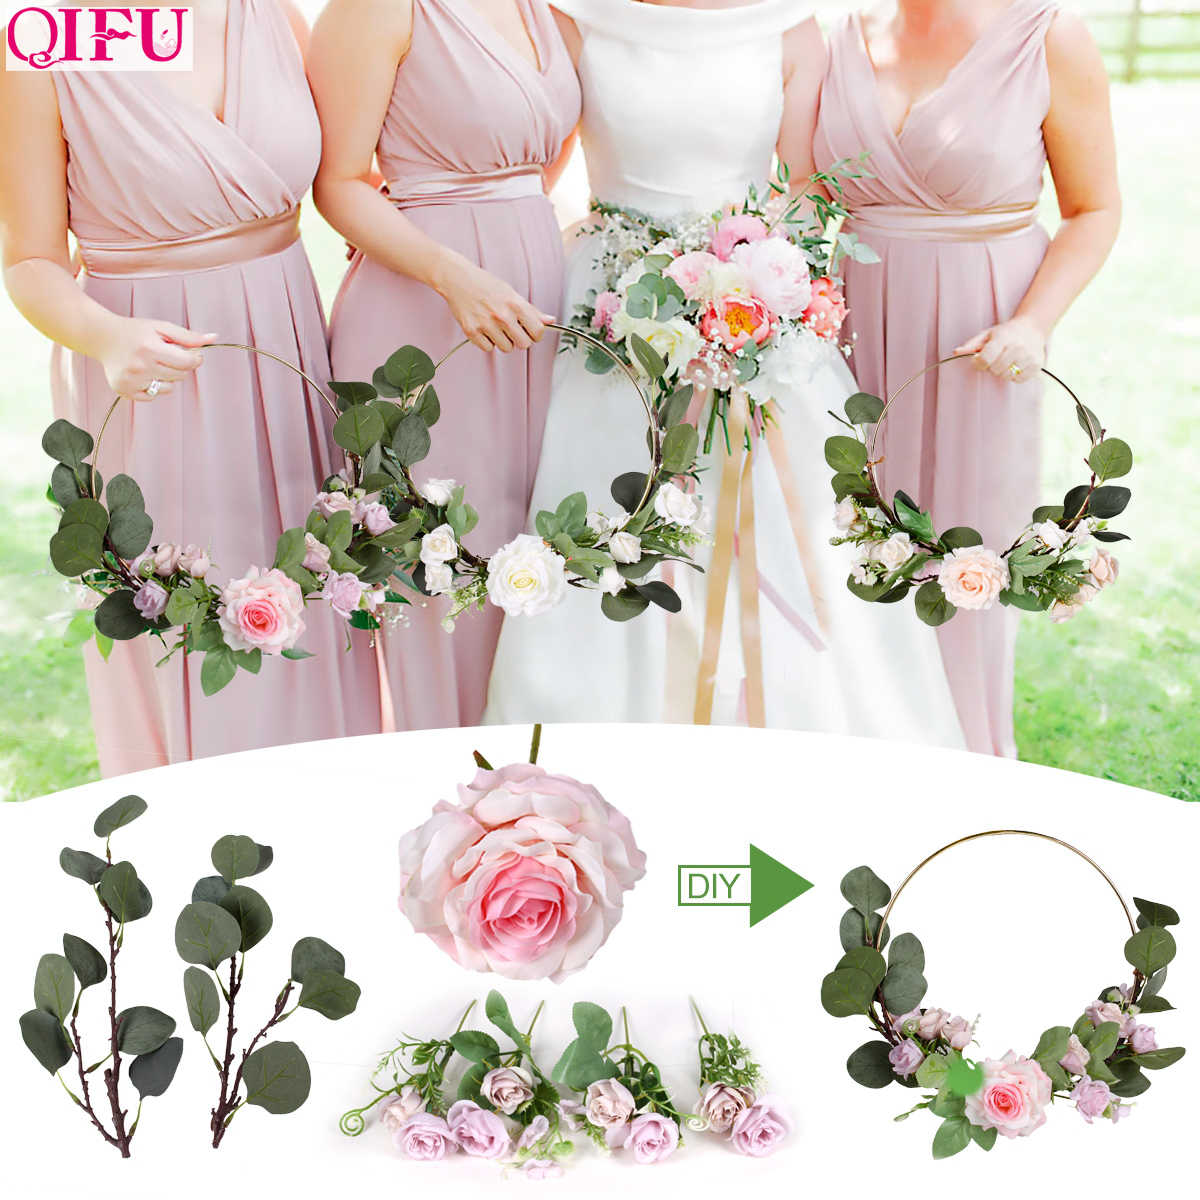 Qifu Rustic Wedding Decor Wooden Photo Holder Artificial Flowers